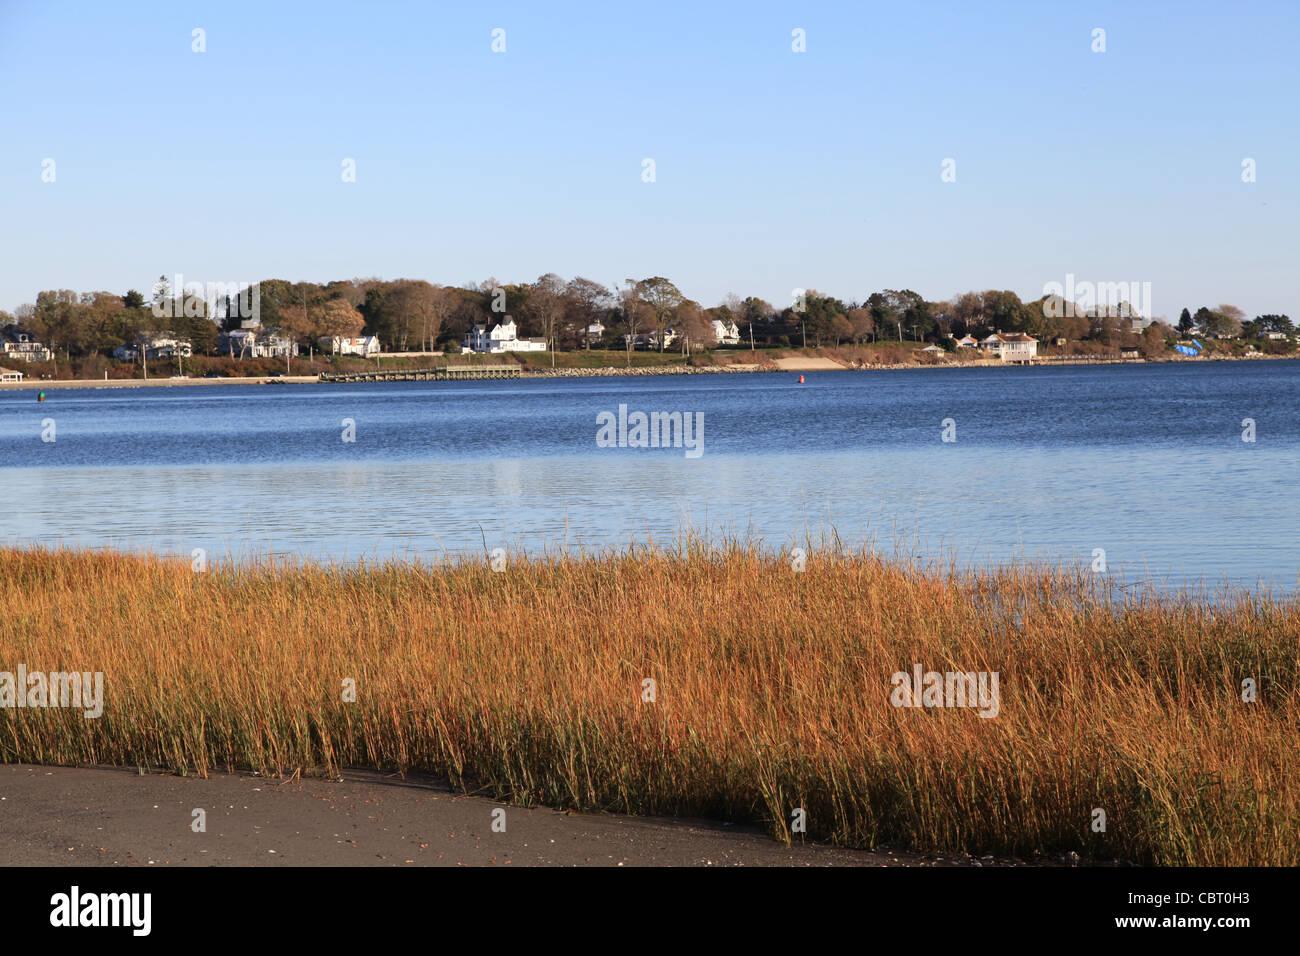 Coast Idyll in New England USA - Stock Image